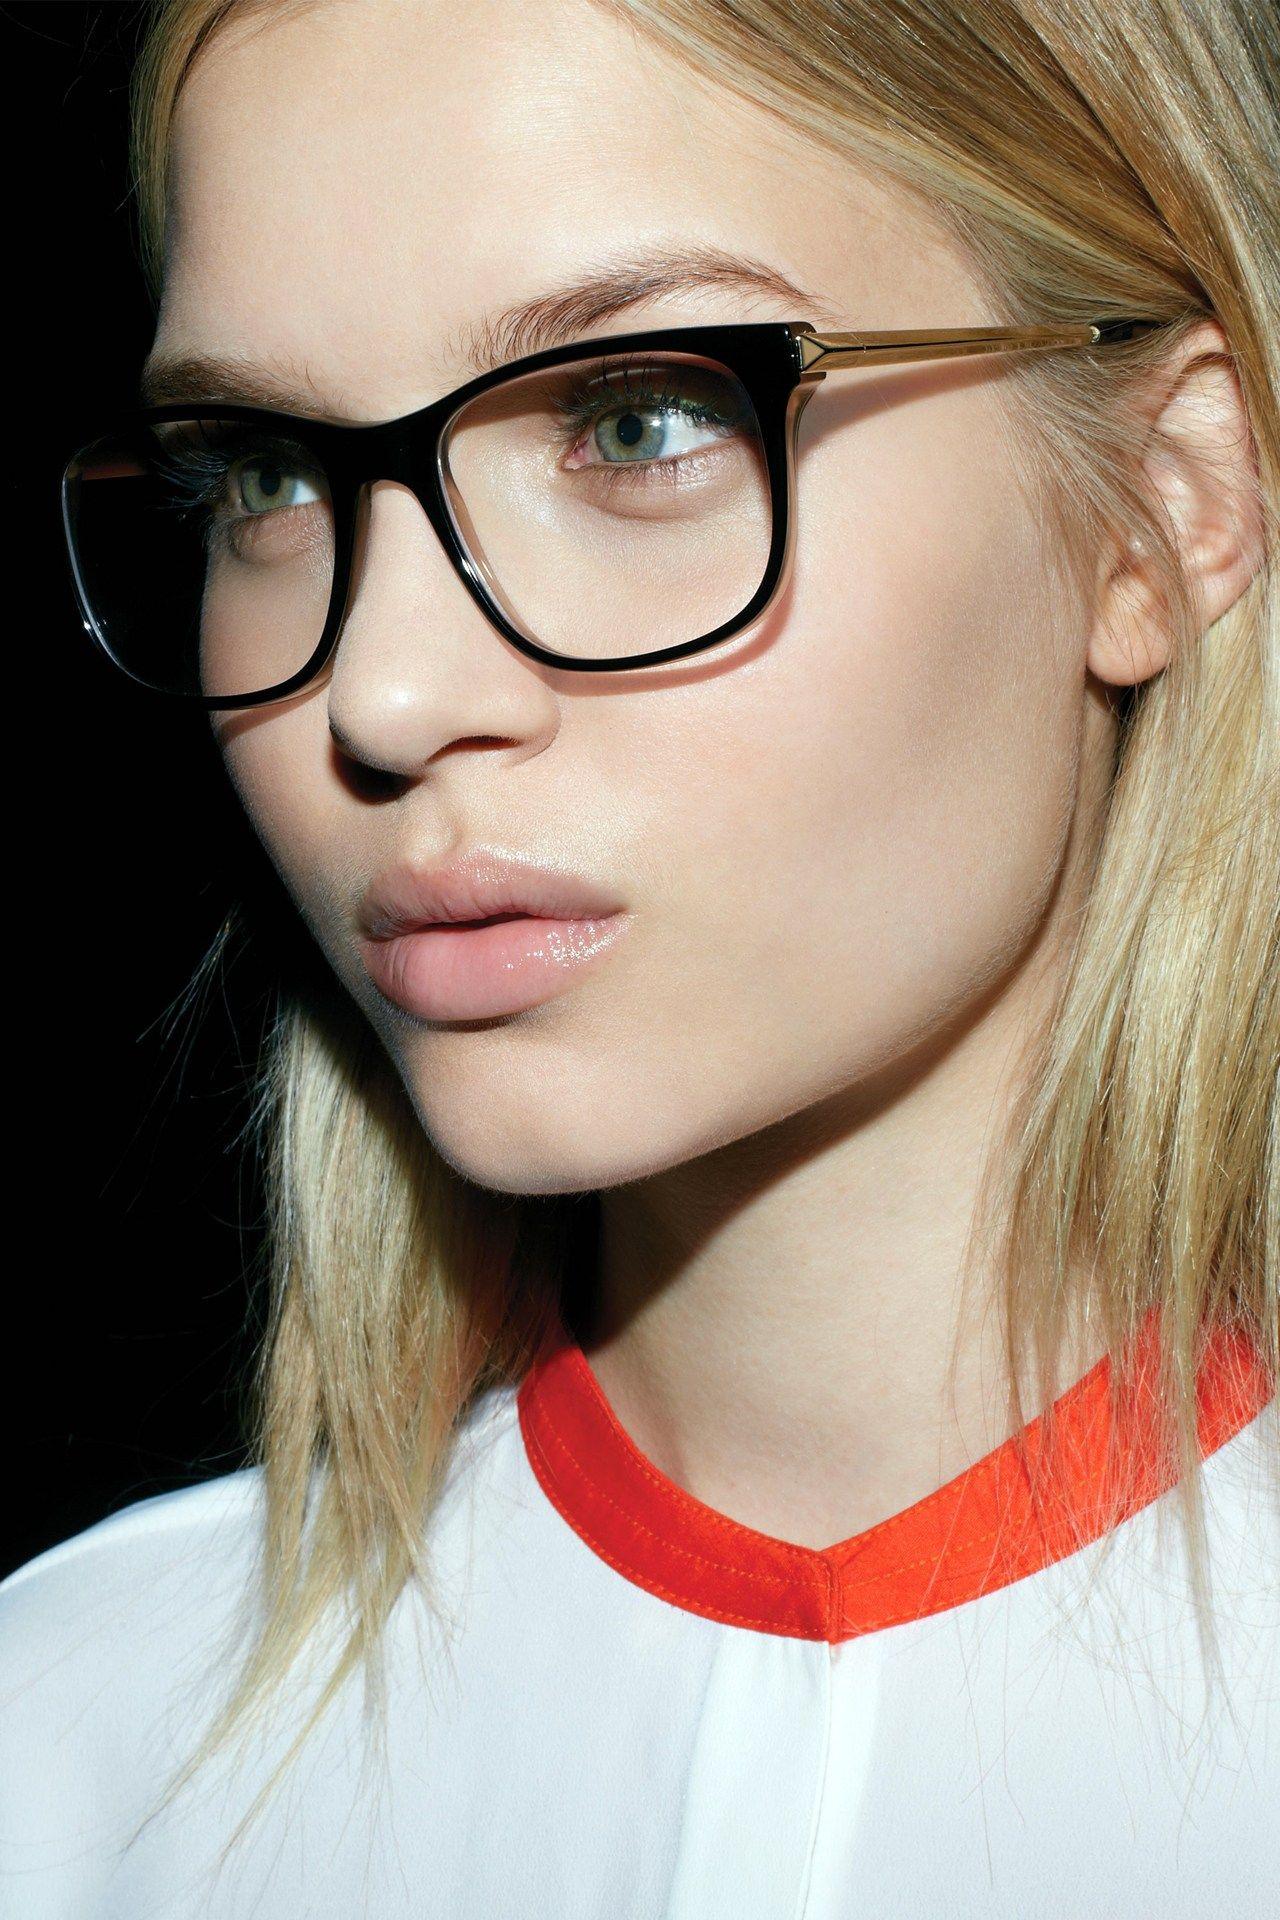 03e8de8de403af Victoria Beckham Launches Opticals Online (Vogue.com UK) Ray Ban Outlet,  Marisa